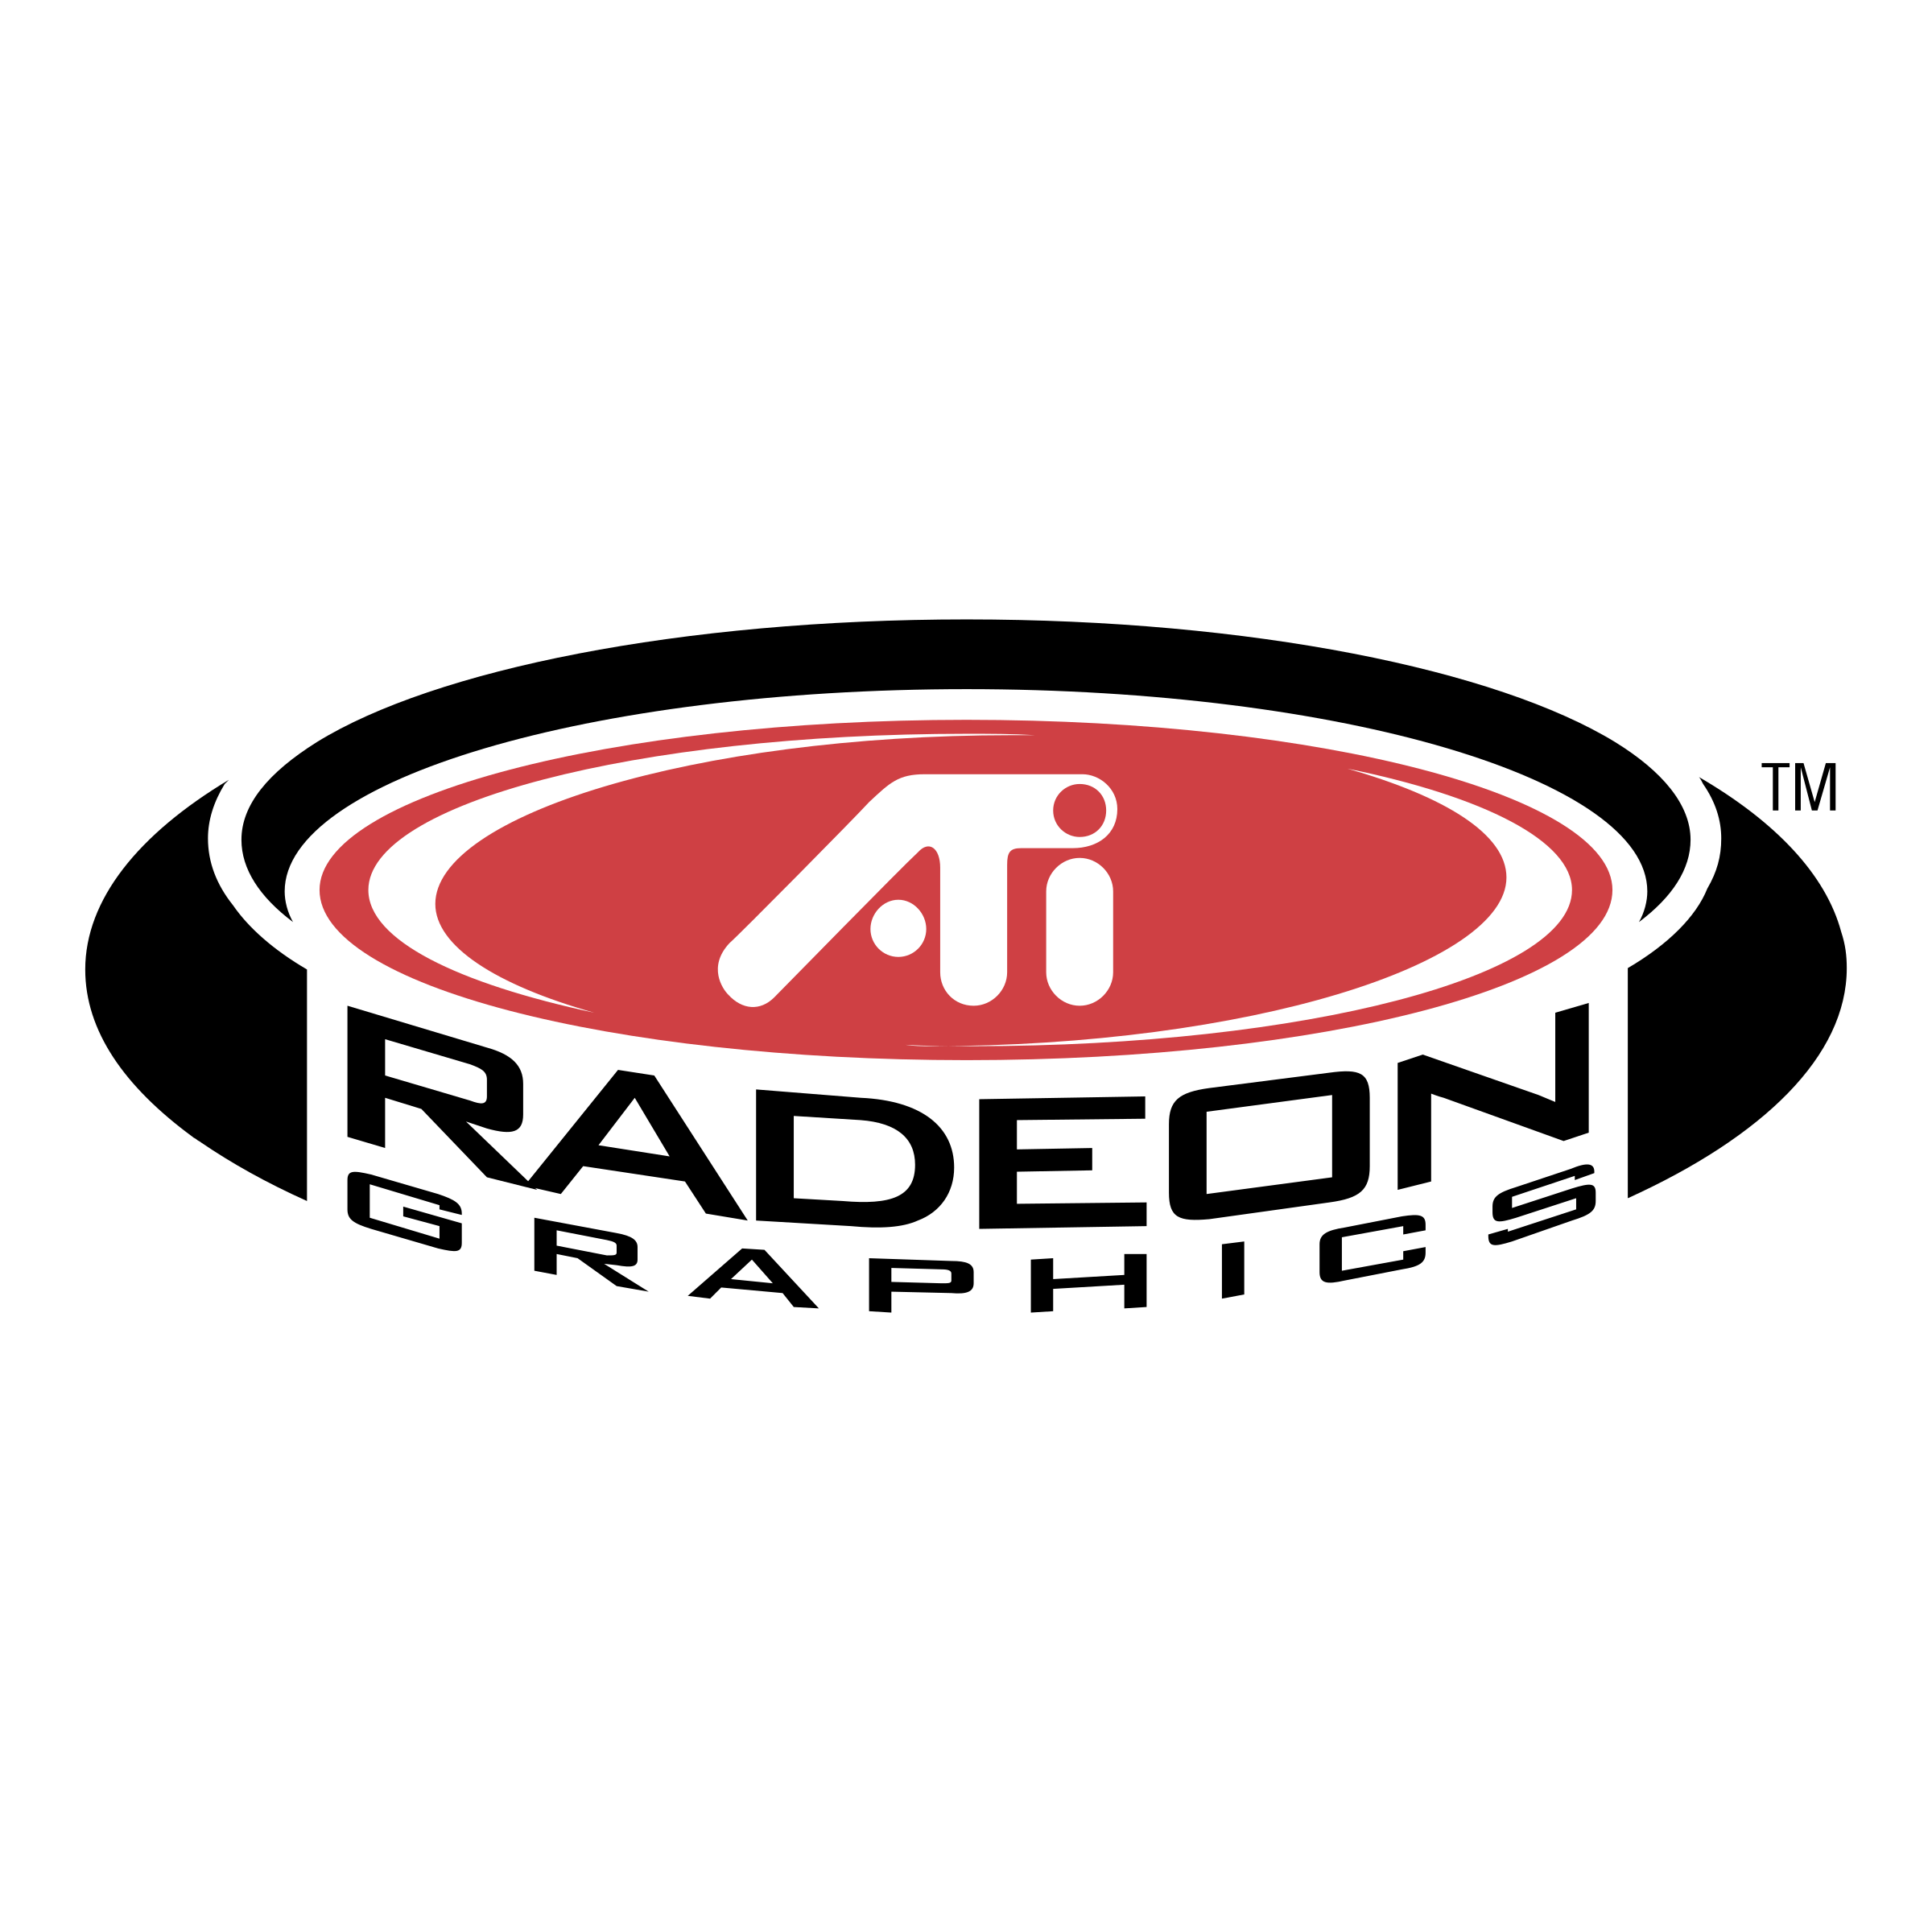 Radeon Graphics Logo PNG Transparent